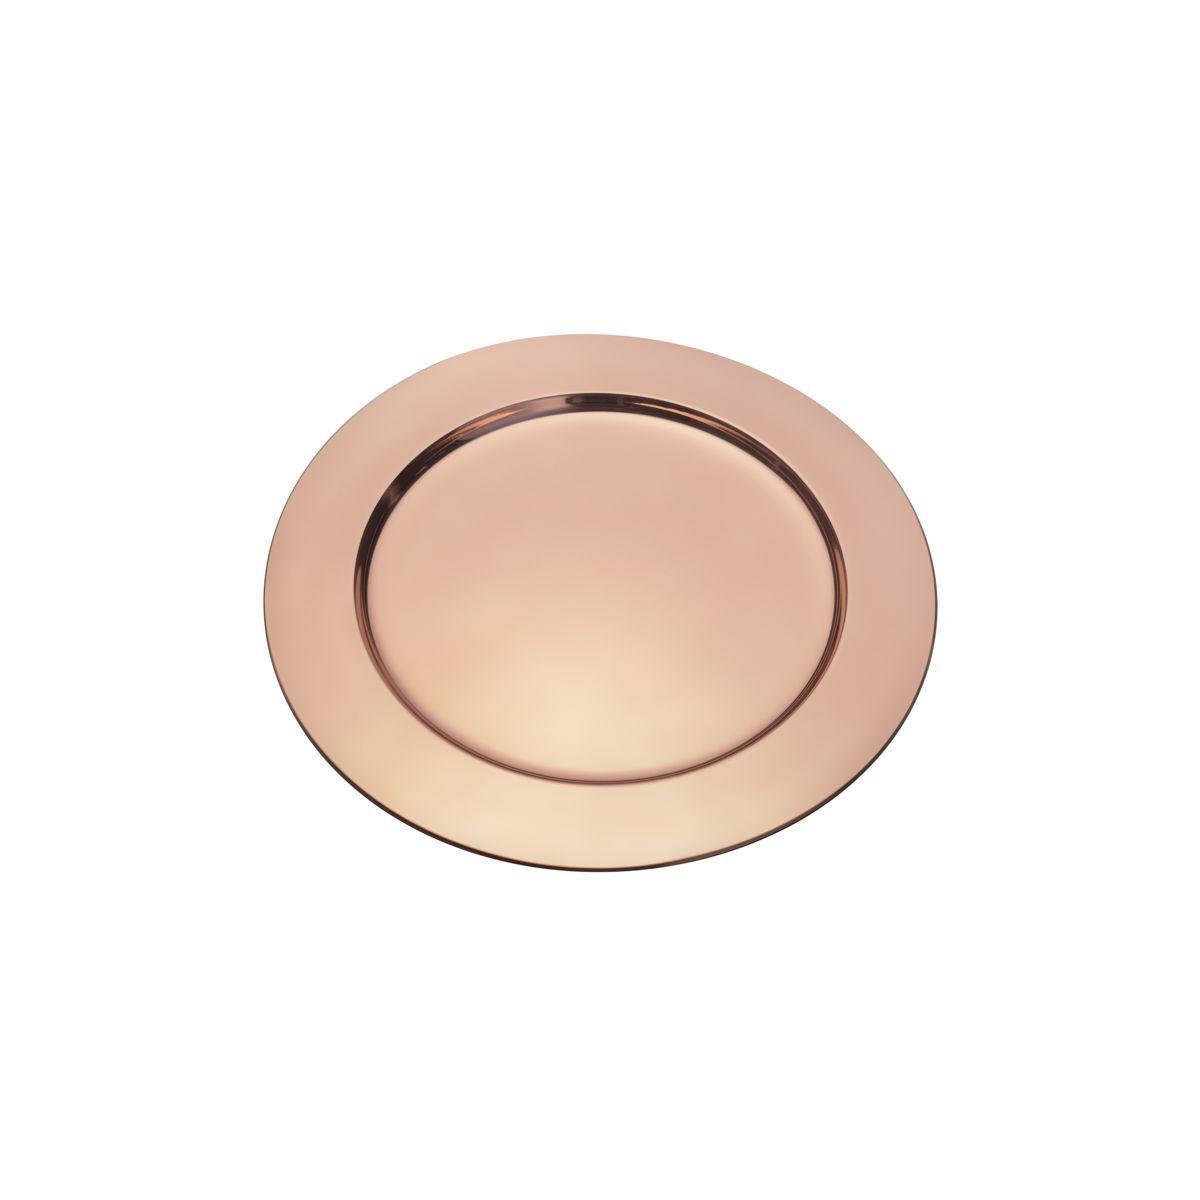 SOUSPLAT INOX ROSE WINCY IXB03109